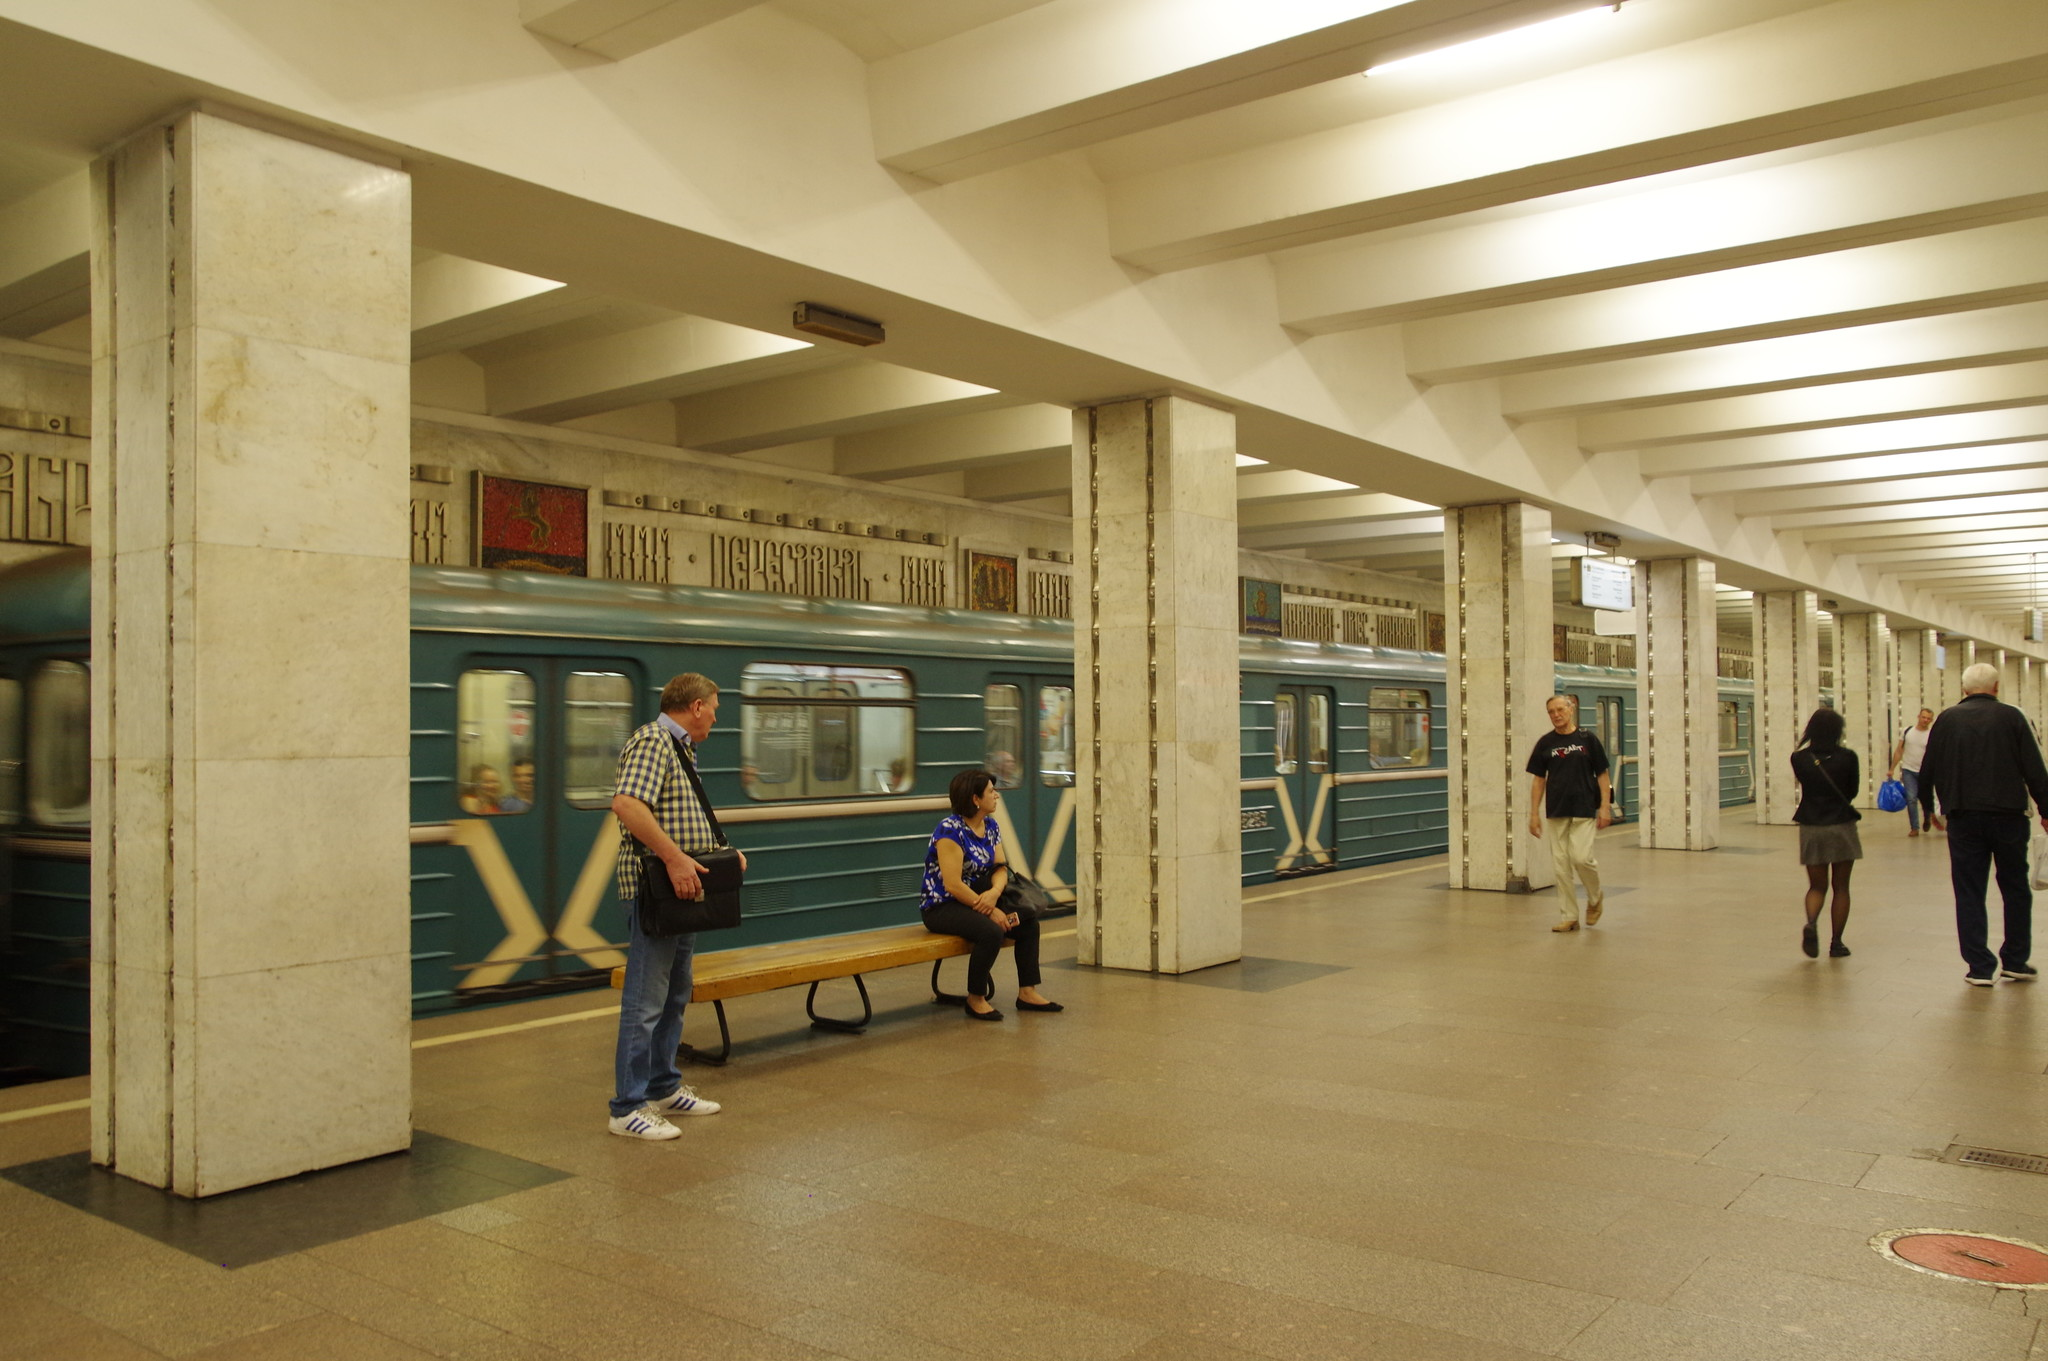 «Свиблово» - станция Московского метрополитена на Калужско-Рижской линии